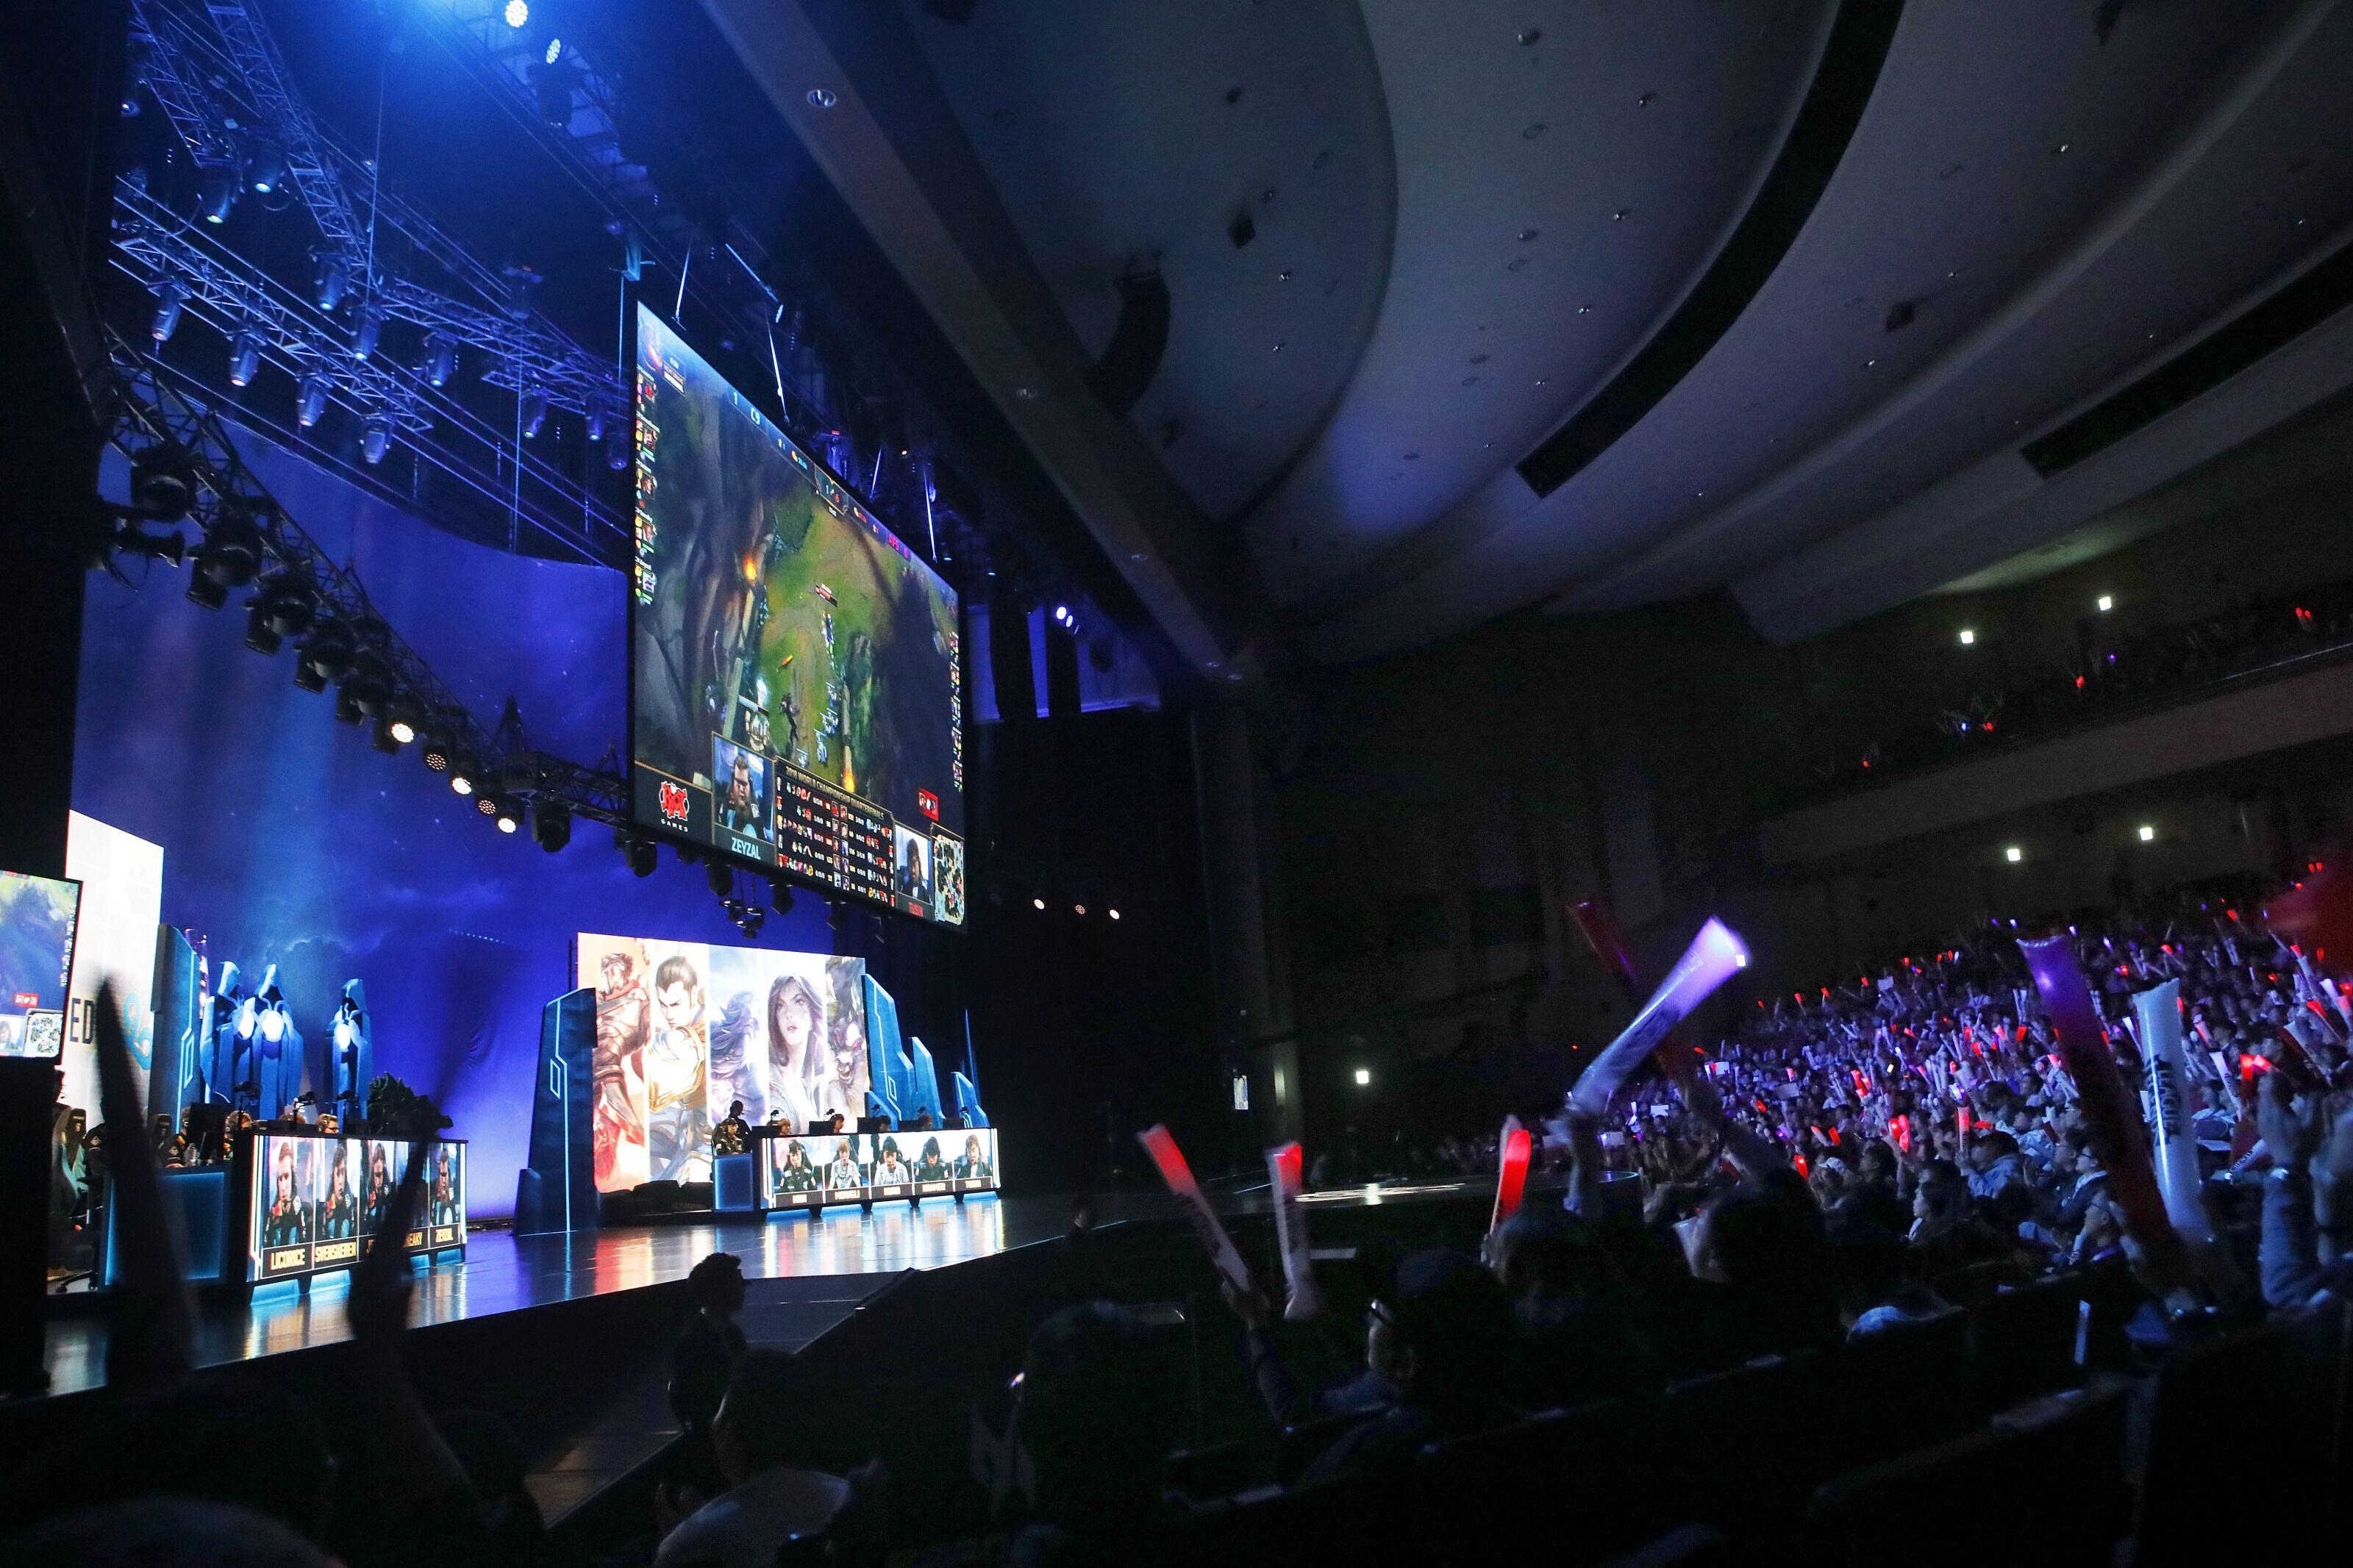 League of Legends: LEC Week 5 – Is it opposite day!?